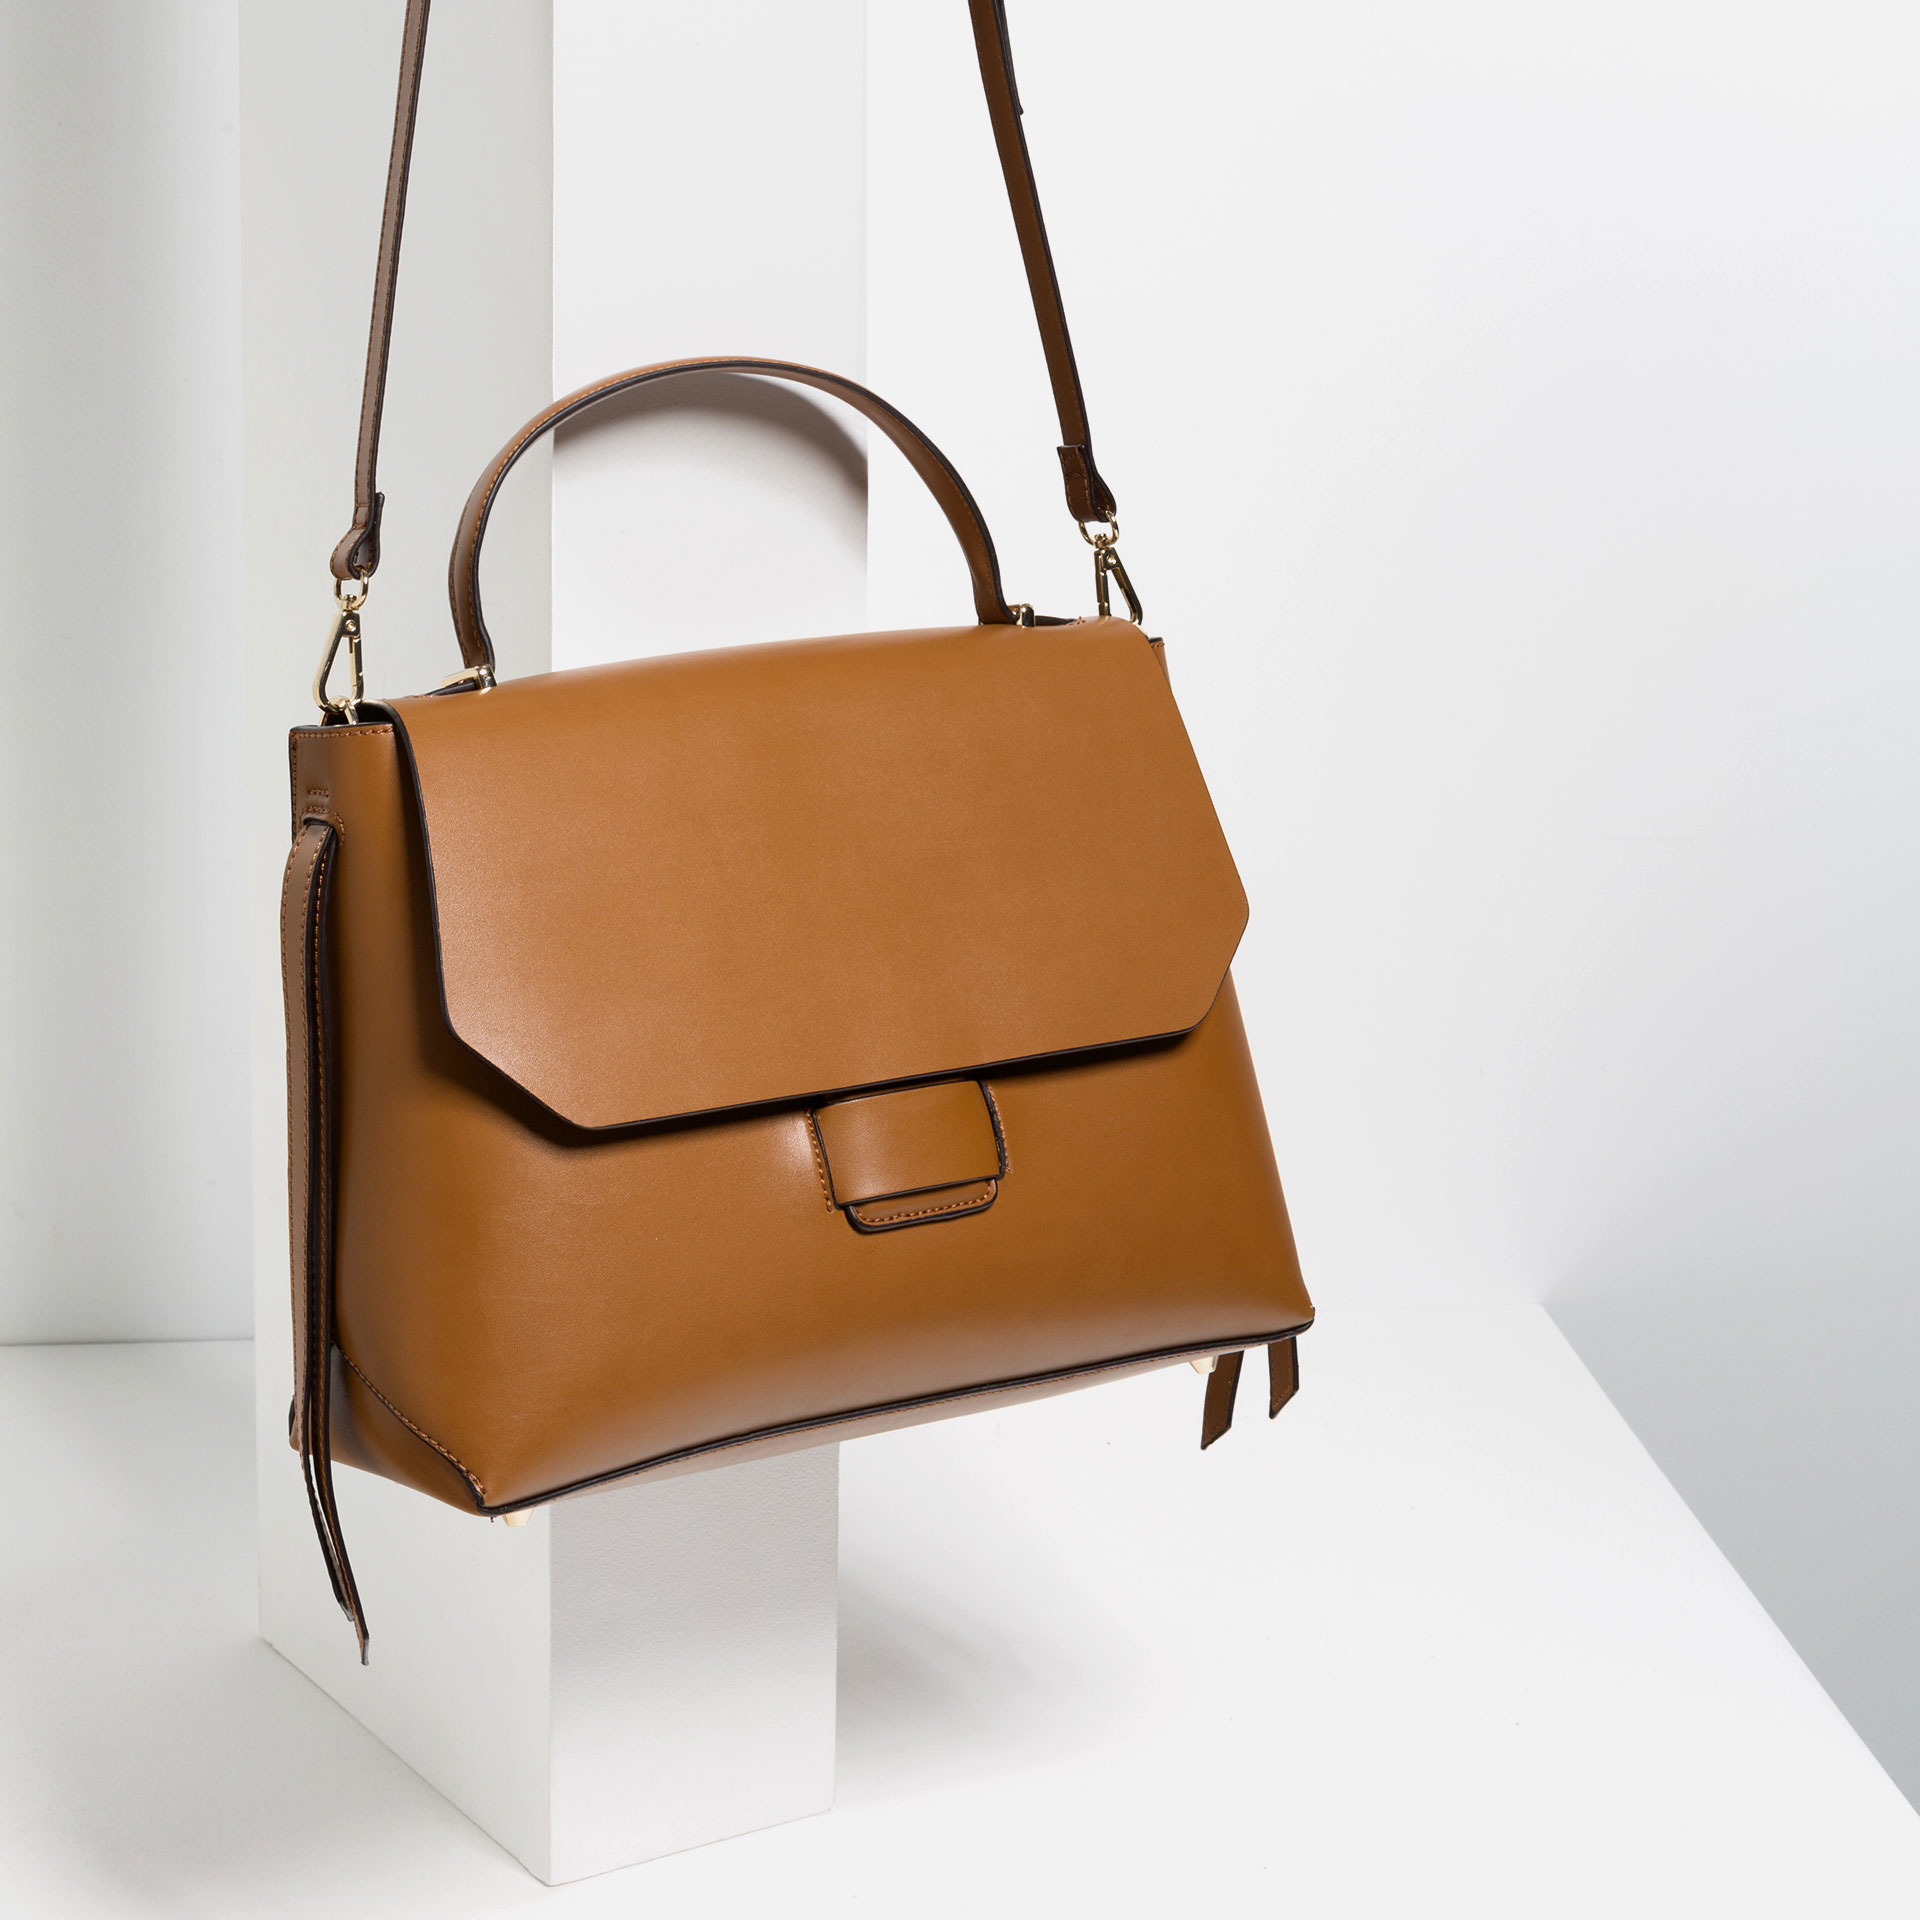 Mini leather tote bag zara - Excellent 13 Off Zara Handbags Zara Women Bucket Bag From Doris39s Closet On